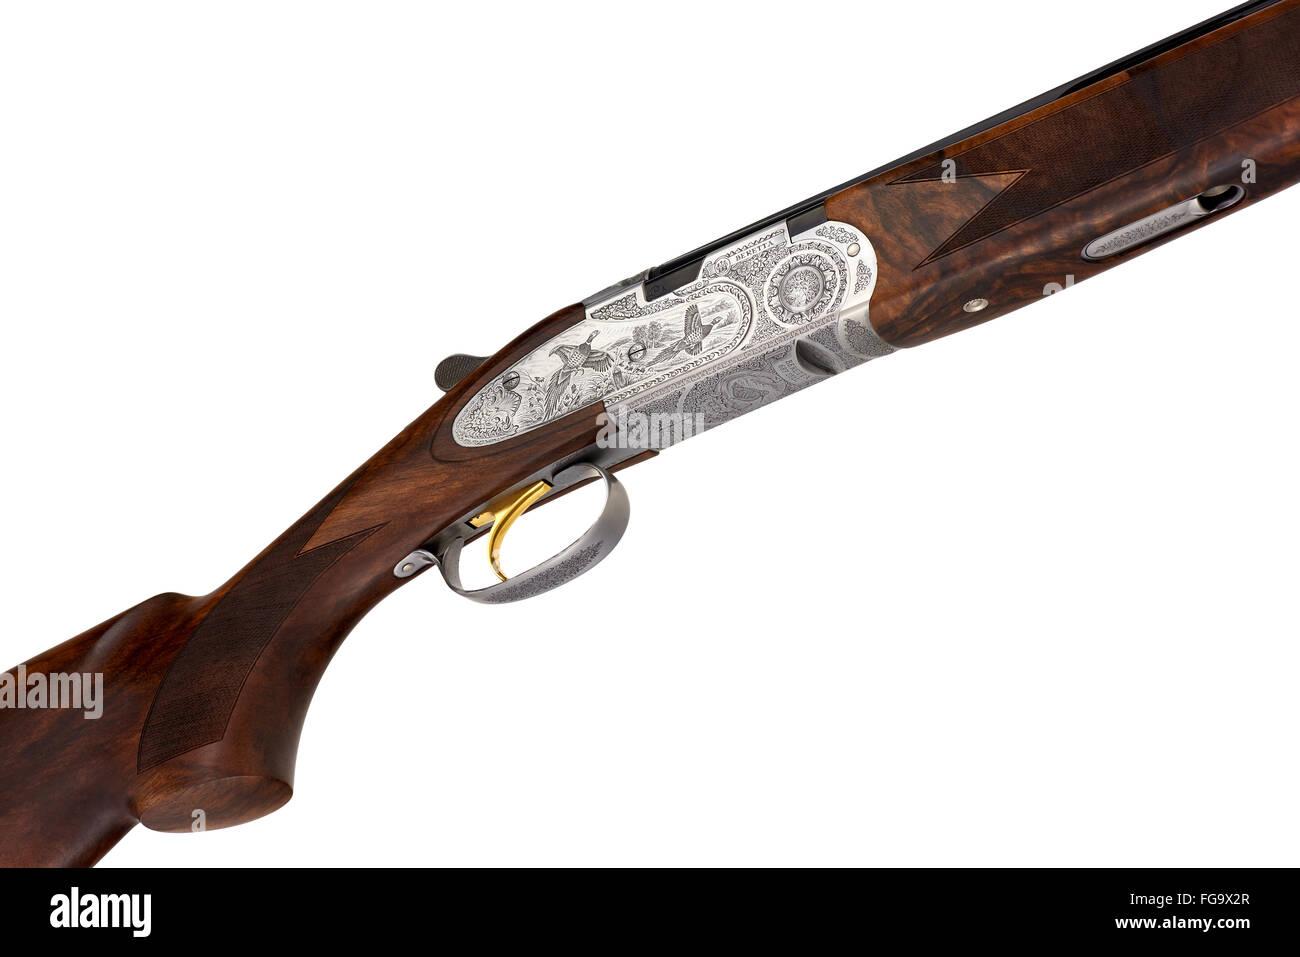 Beretta 687 EELL Diamond Pigeon 28ga over and under shotgun.